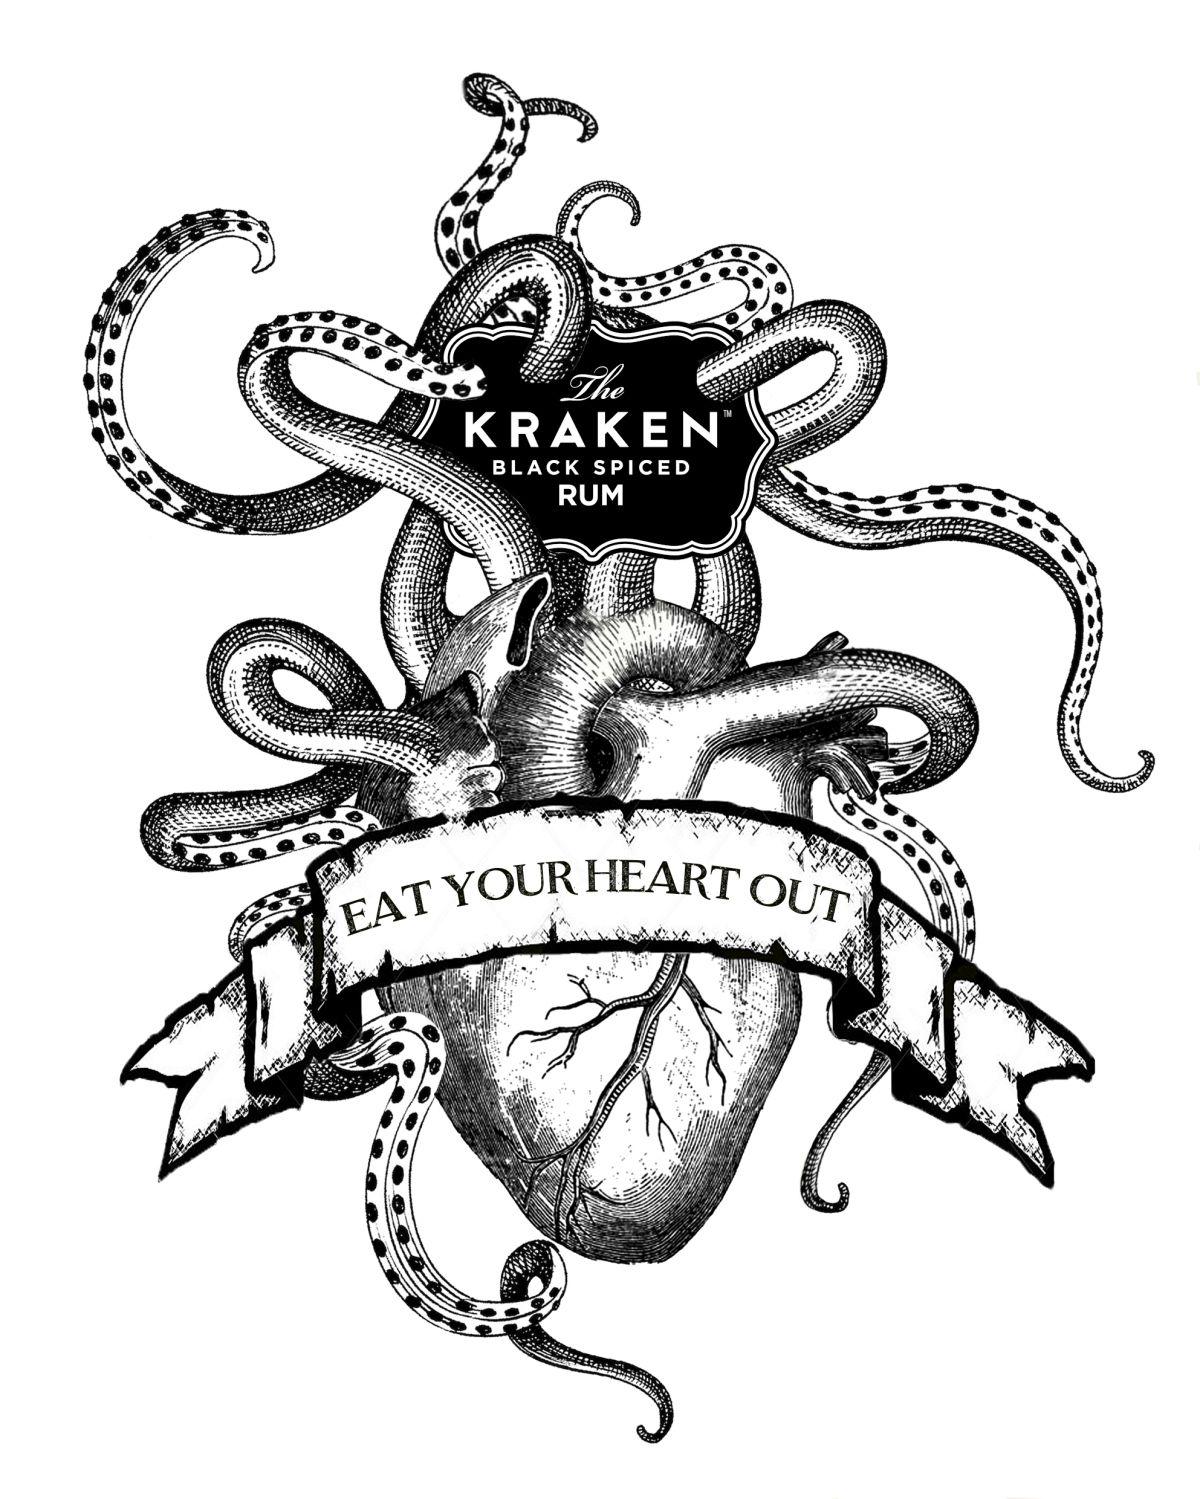 KRAKEN_HEART_FINAL   S.r Mallik Lc   Pinterest   Oktopus, Krake und ...